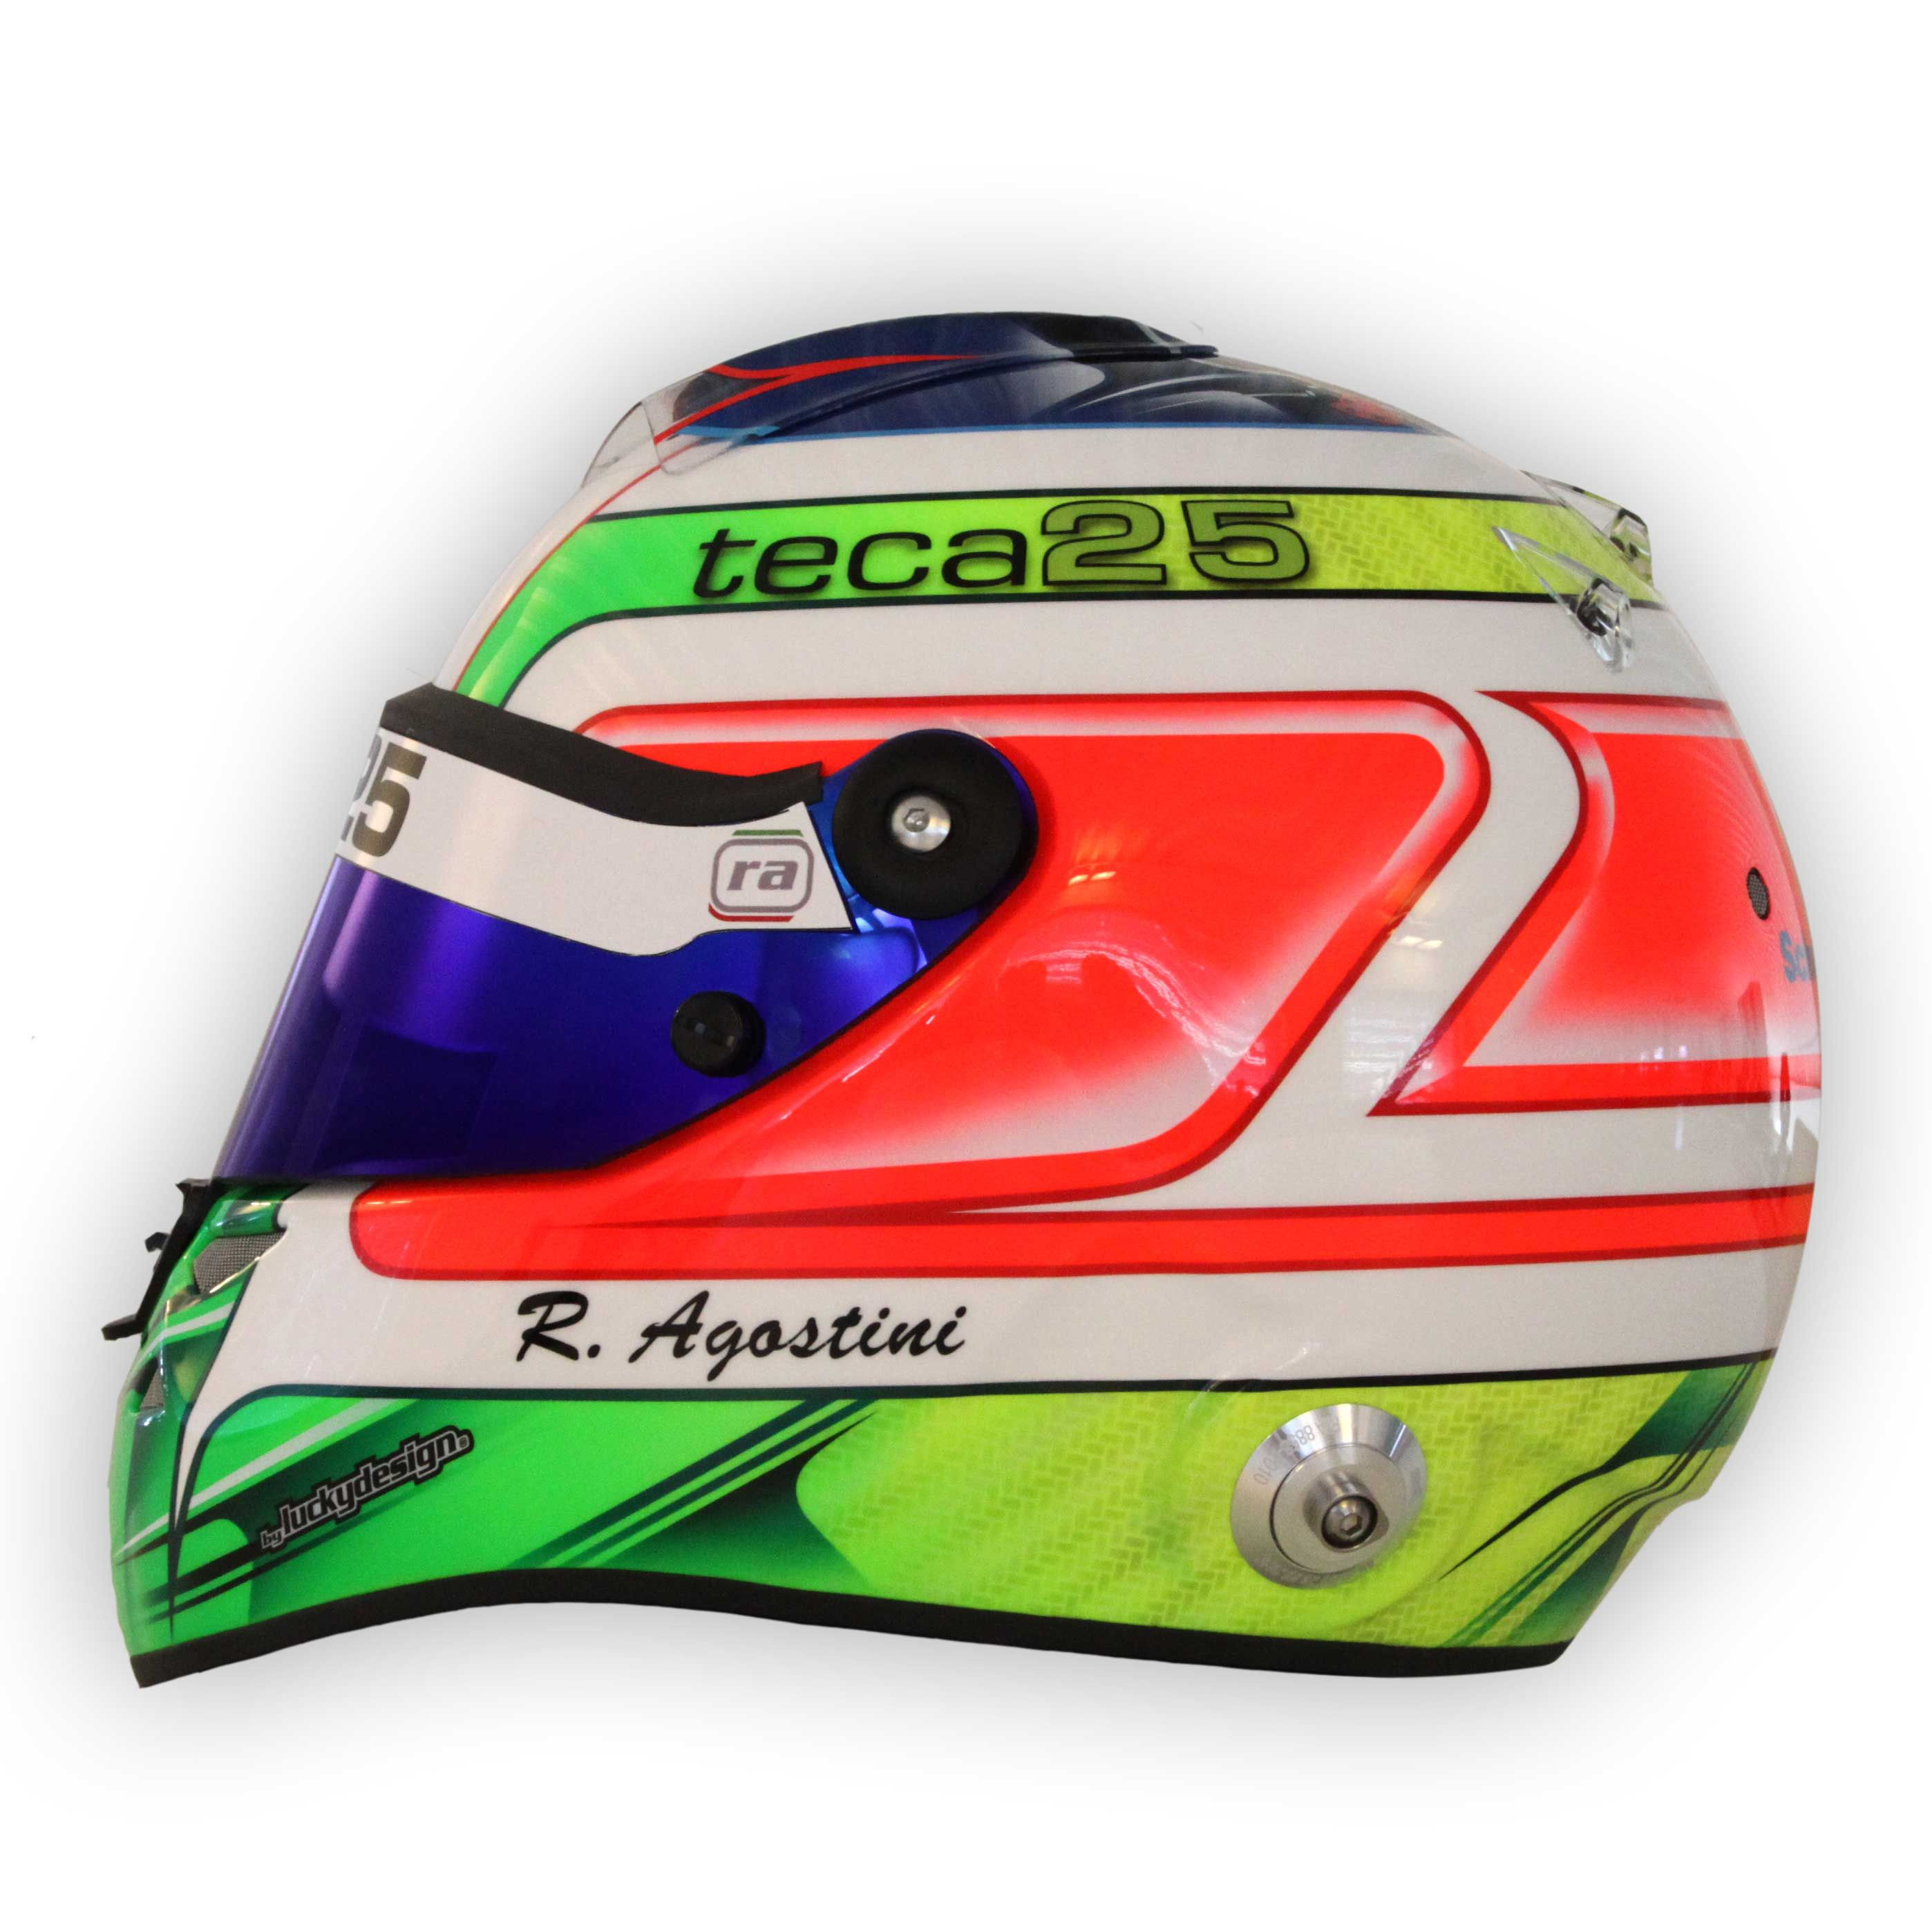 #Teca25 helmet by #Schuberth for #Riccardo #Agostini - side view